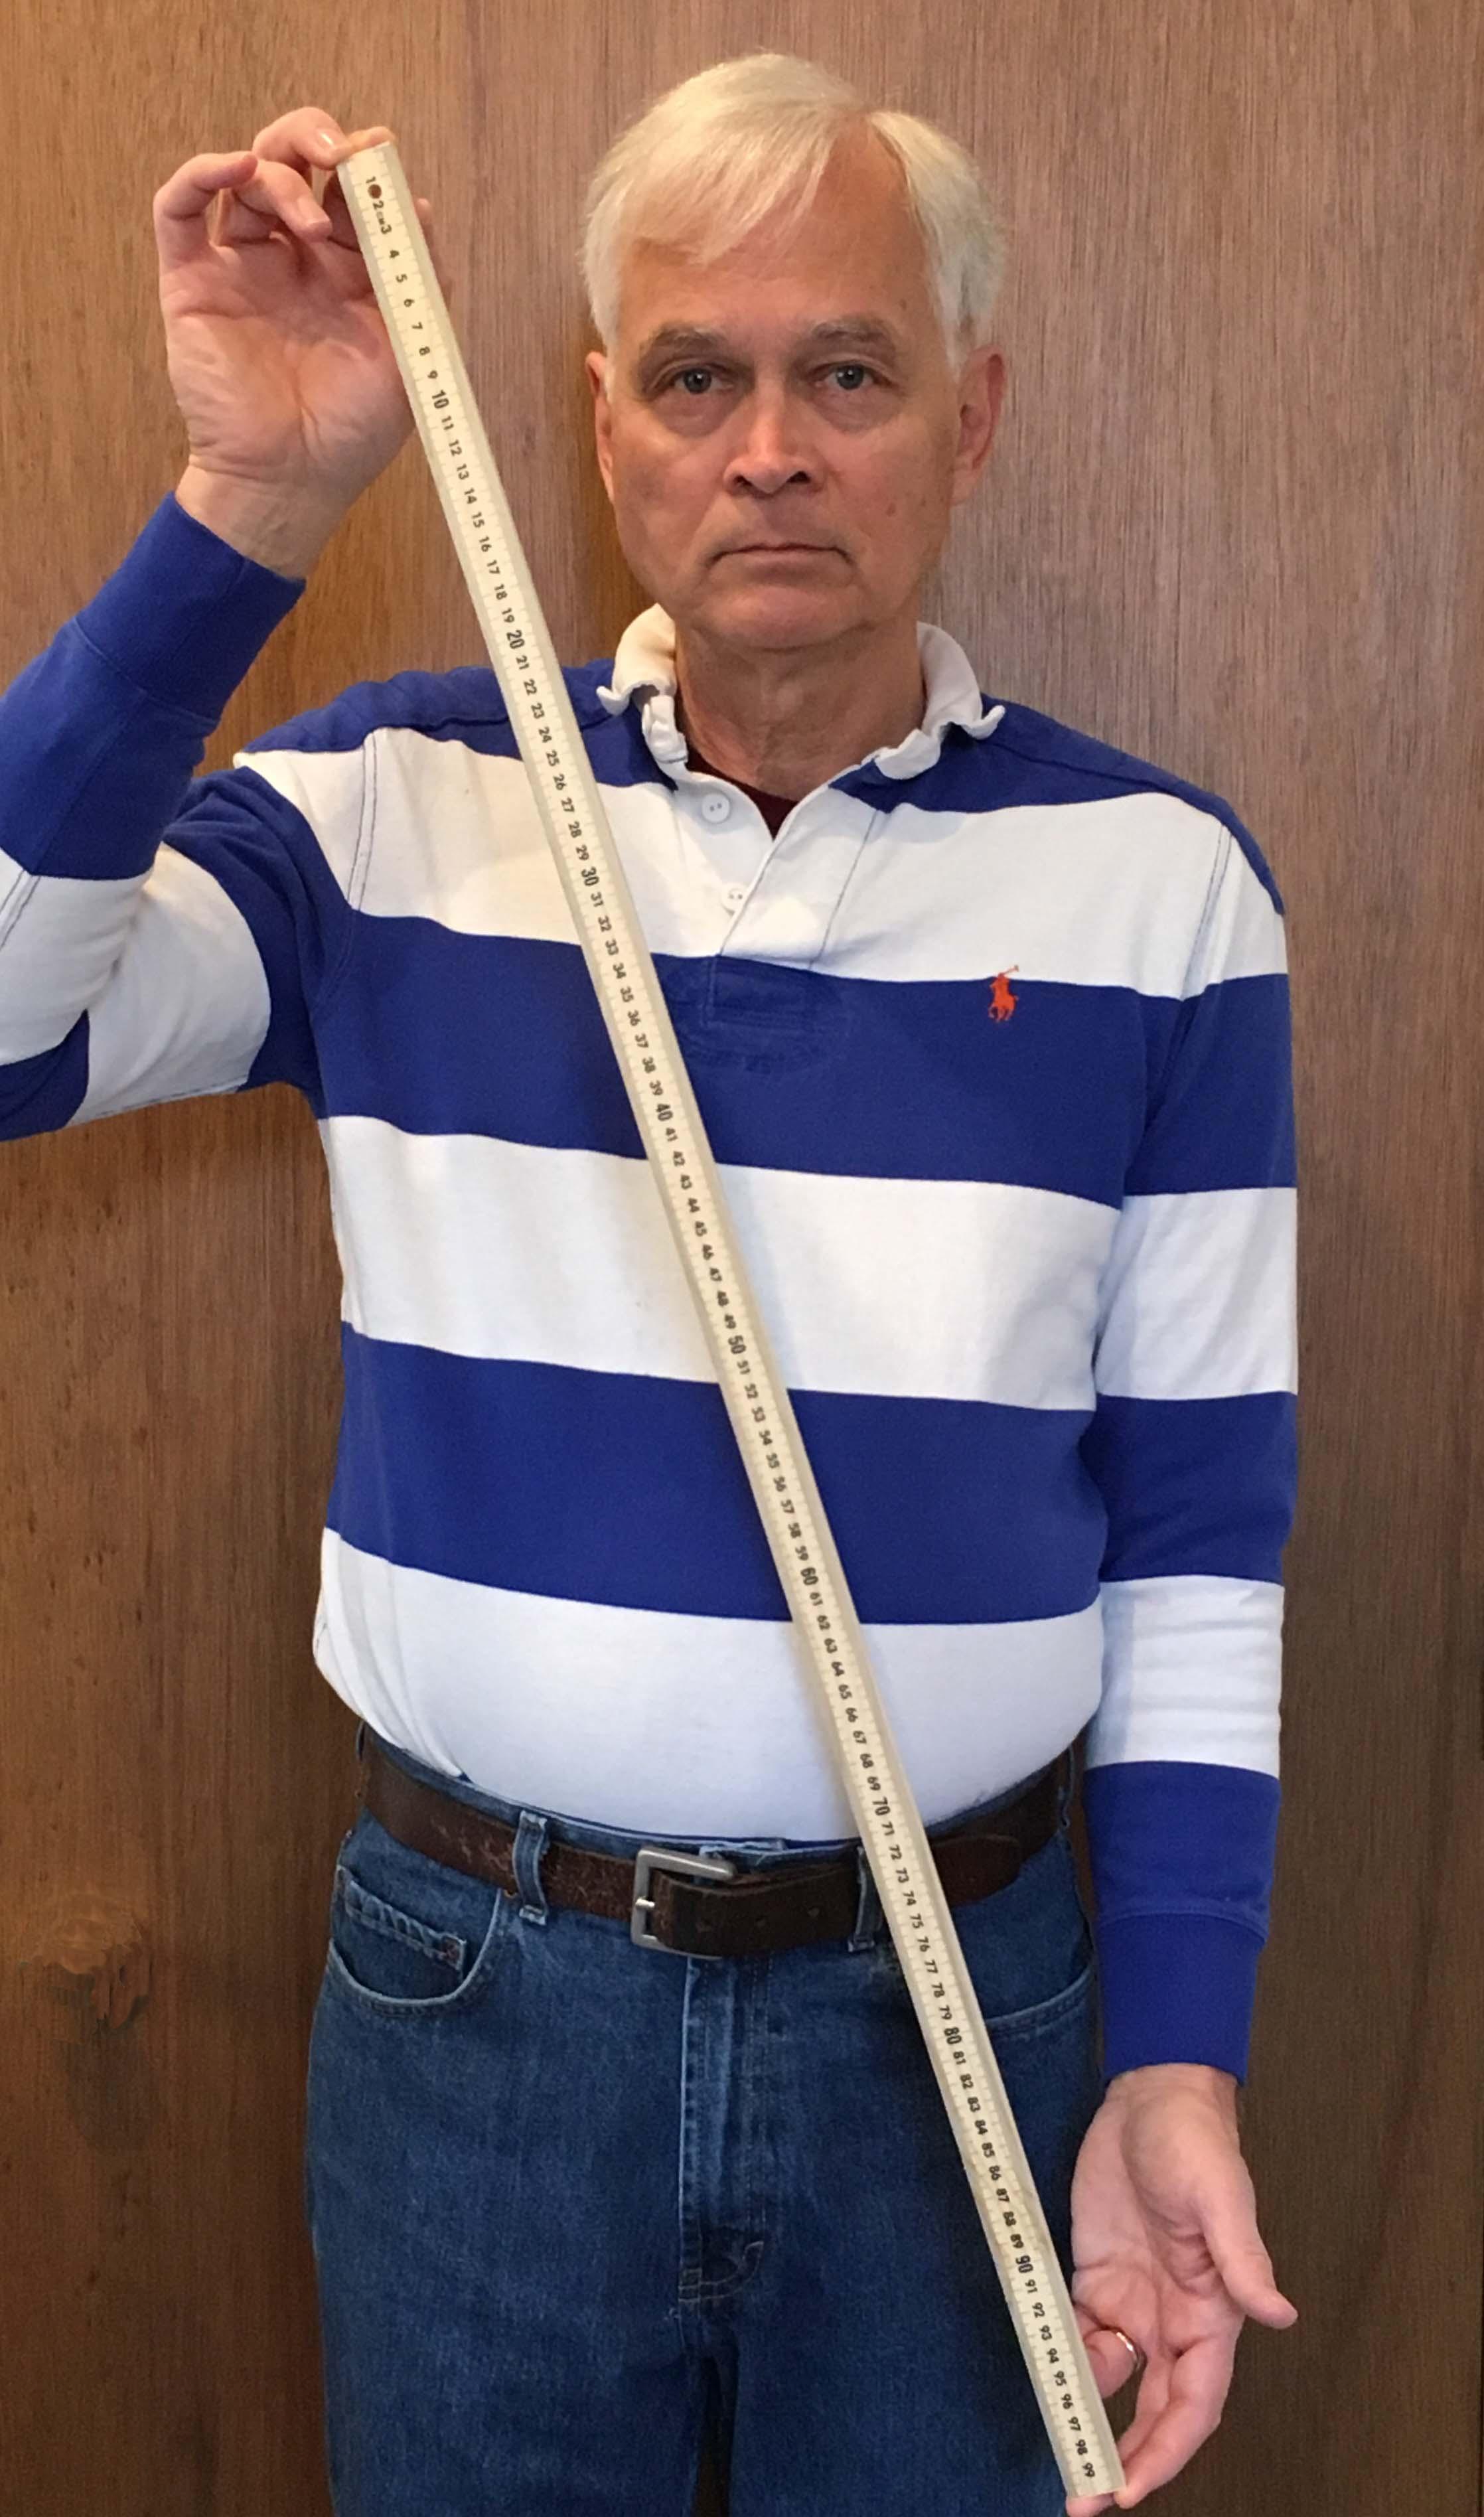 picture regarding Printable Meter Sticks identified as Meterstick - Wikipedia